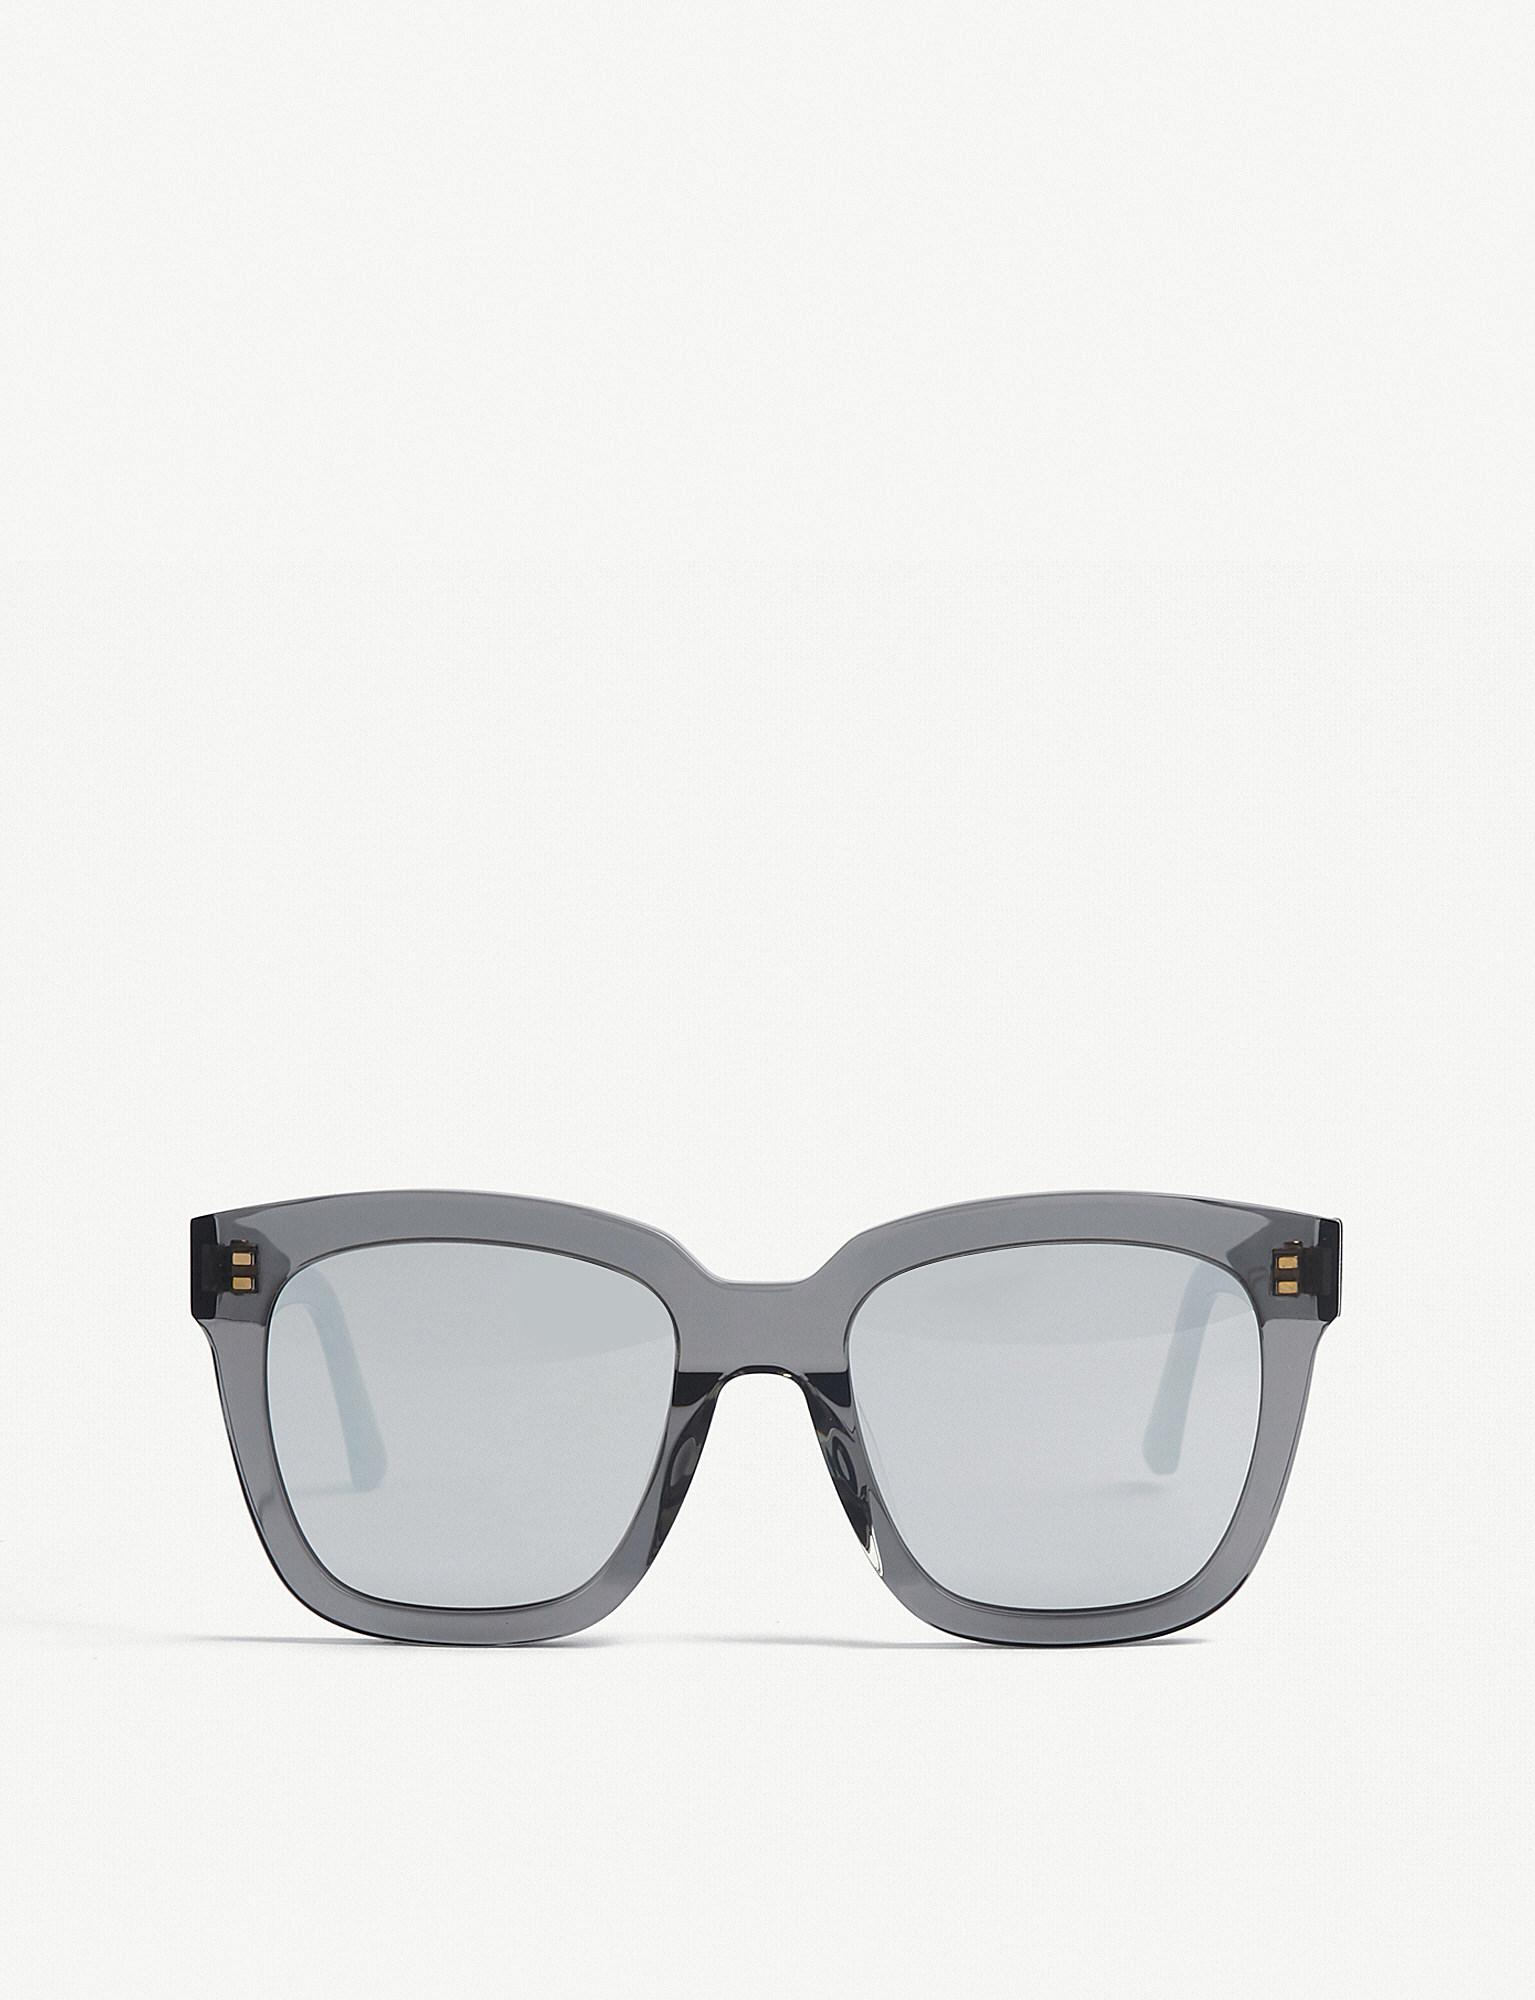 486c3d1628 Lyst - Gentle Monster Dreamer Hoff Mirrored Acetate Sunglasses in Gray